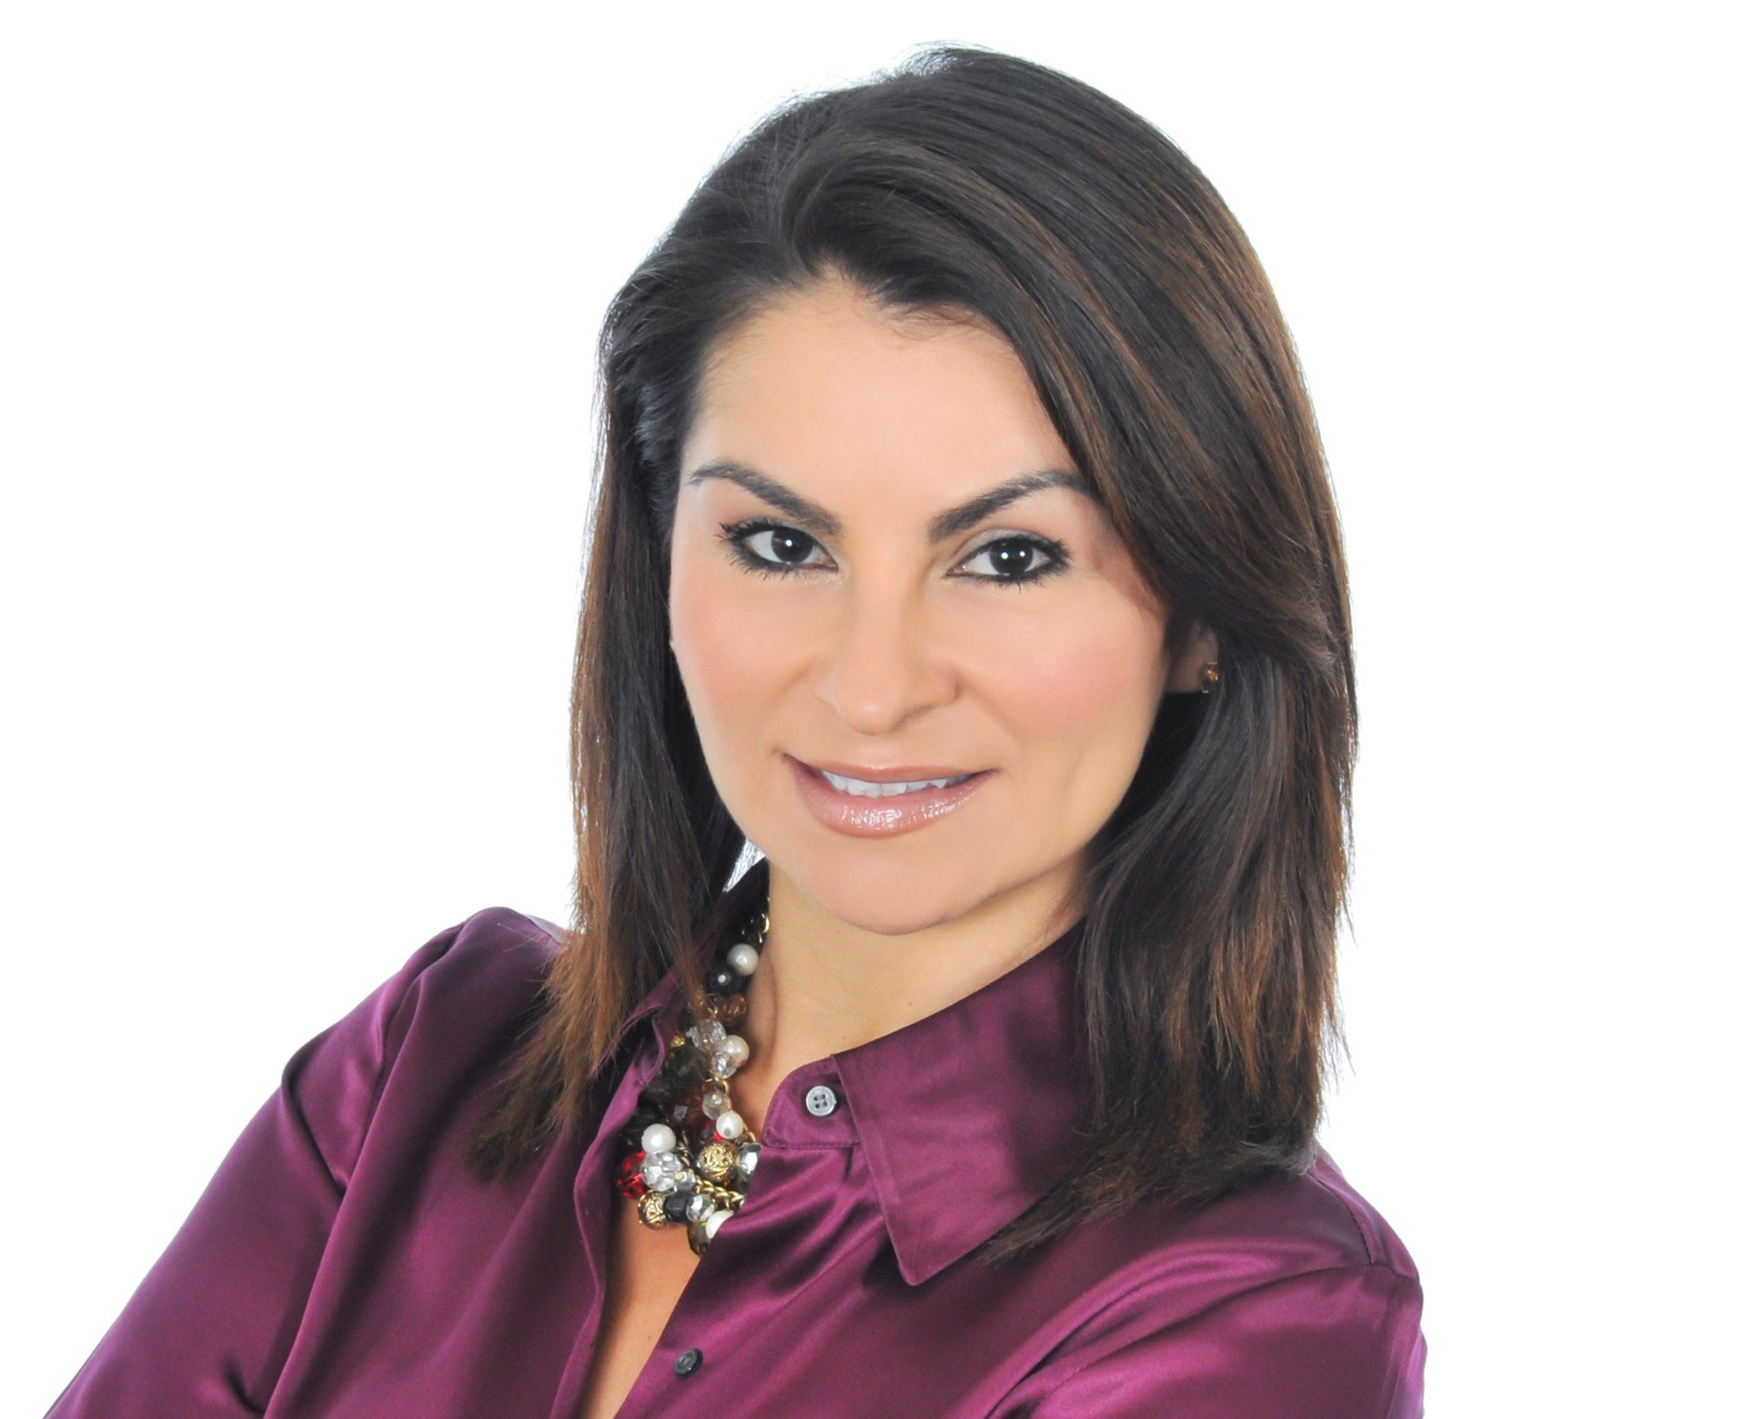 Nancee Marquez Whittington, Incoming Quality New Mexico President